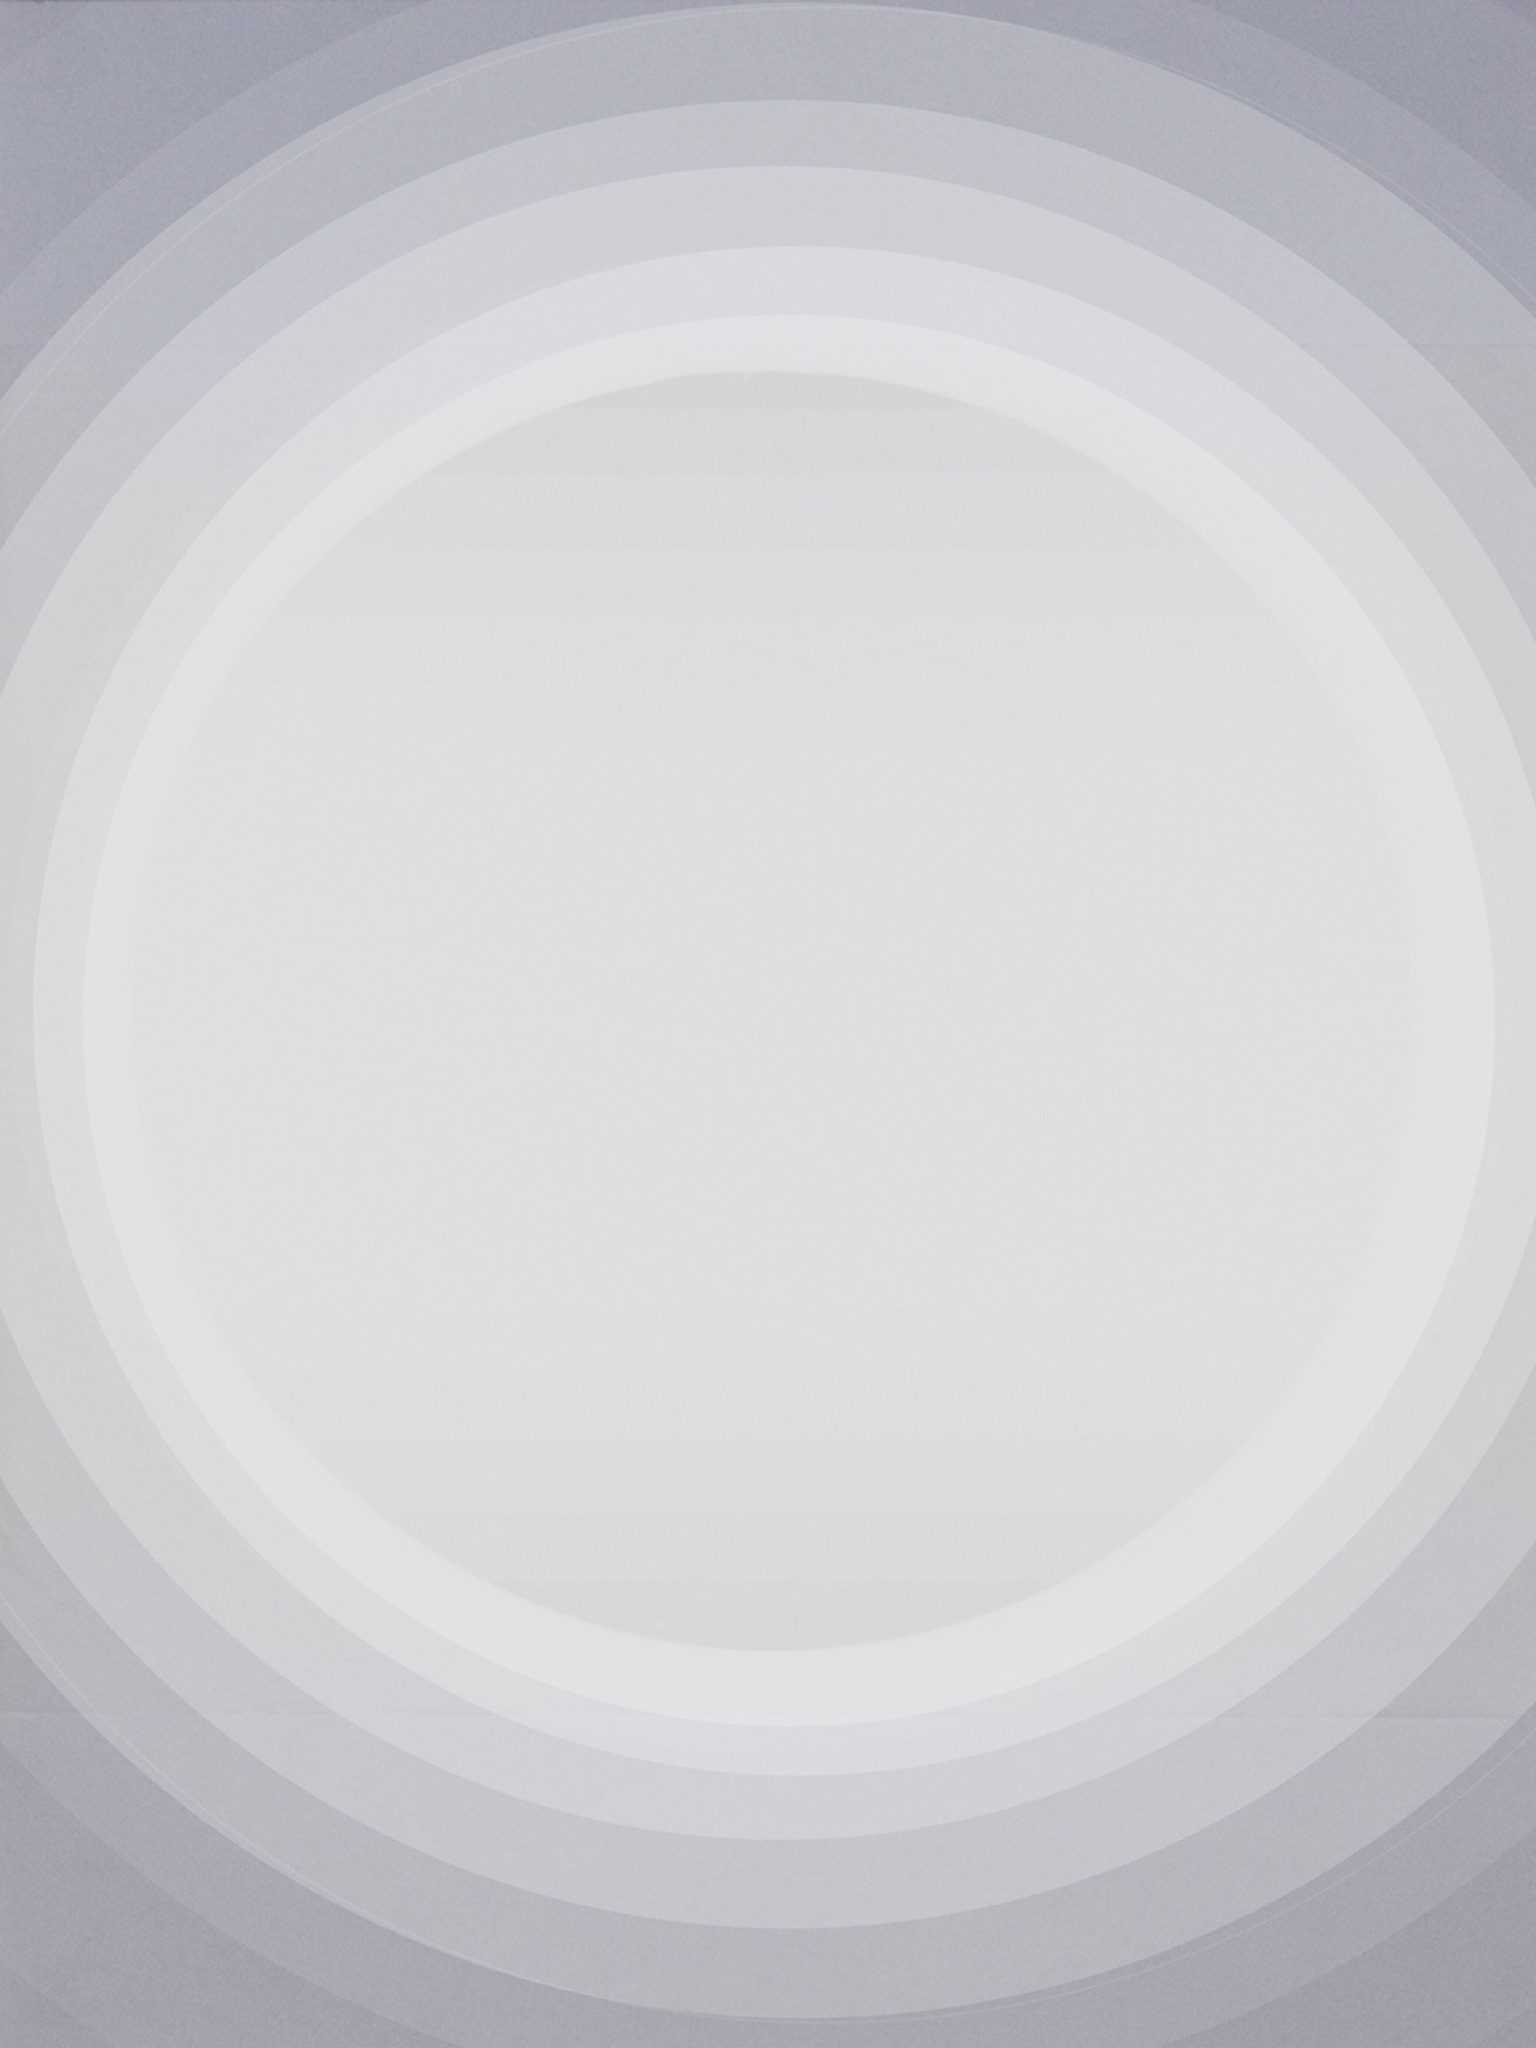 Light vortex transition,  Tissue on high gloss black card with digital layers, digital image, 2016